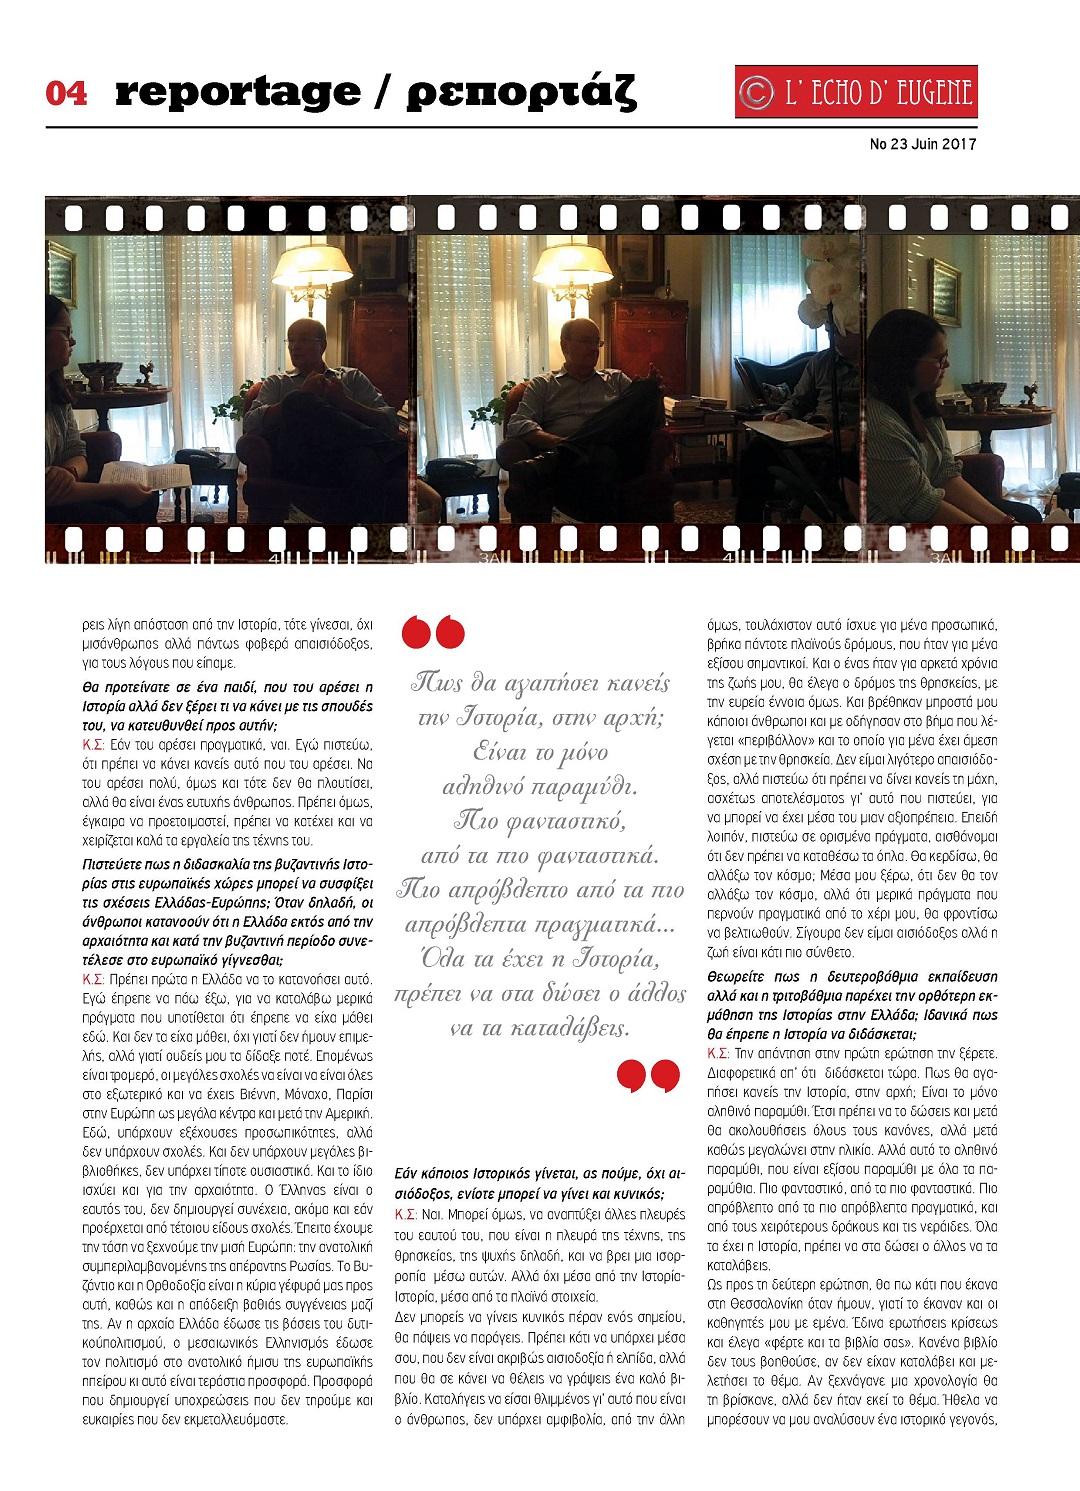 Echo d'Eugène numéro 23  (Juin 2017)-3